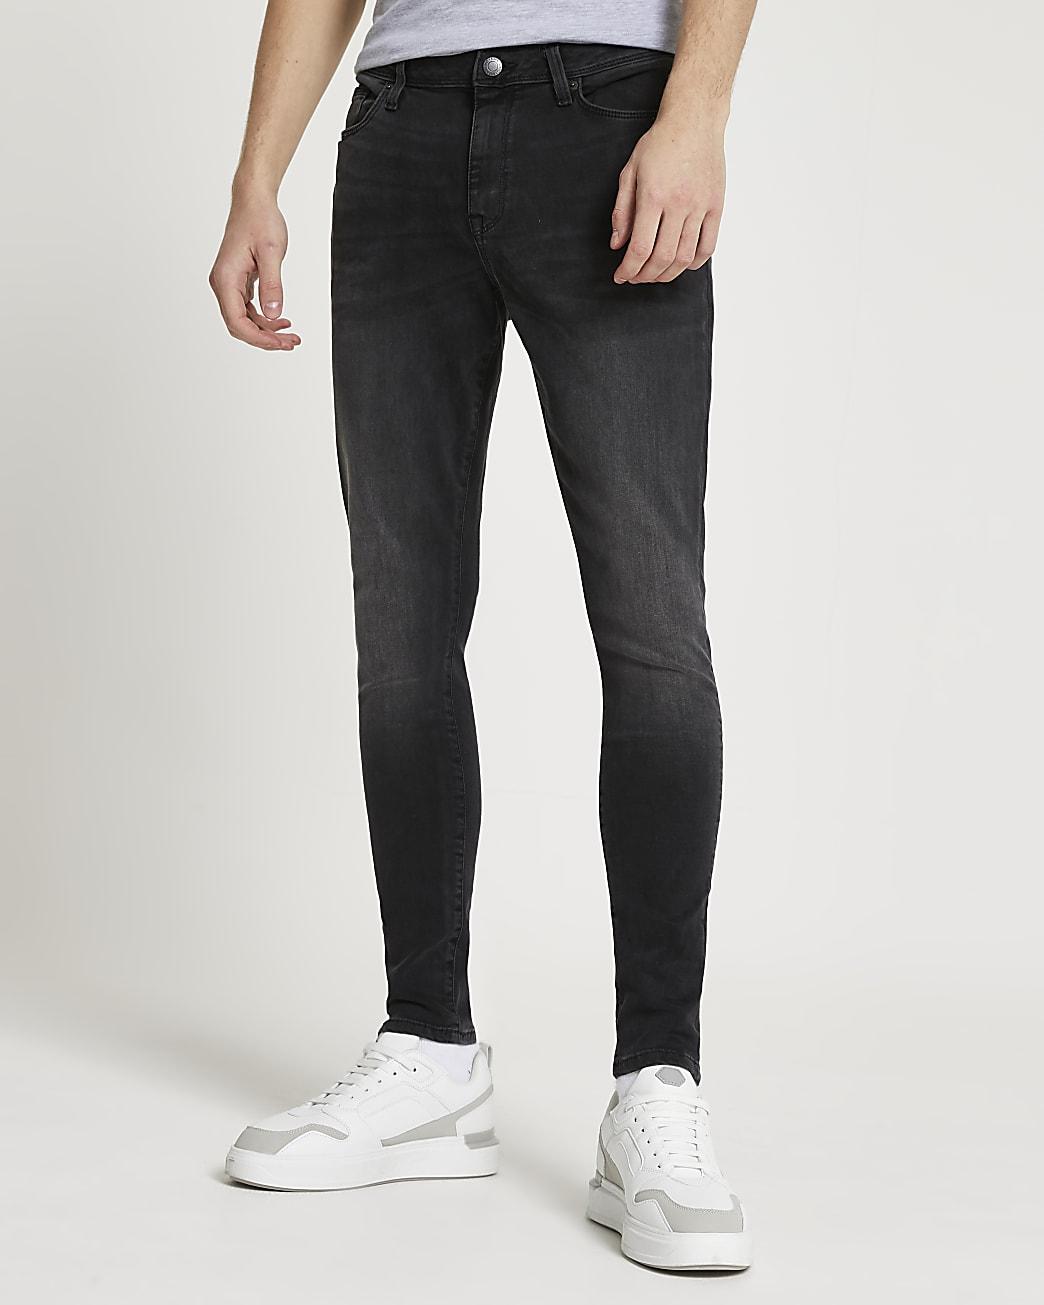 Black washed spray on skinny jeans